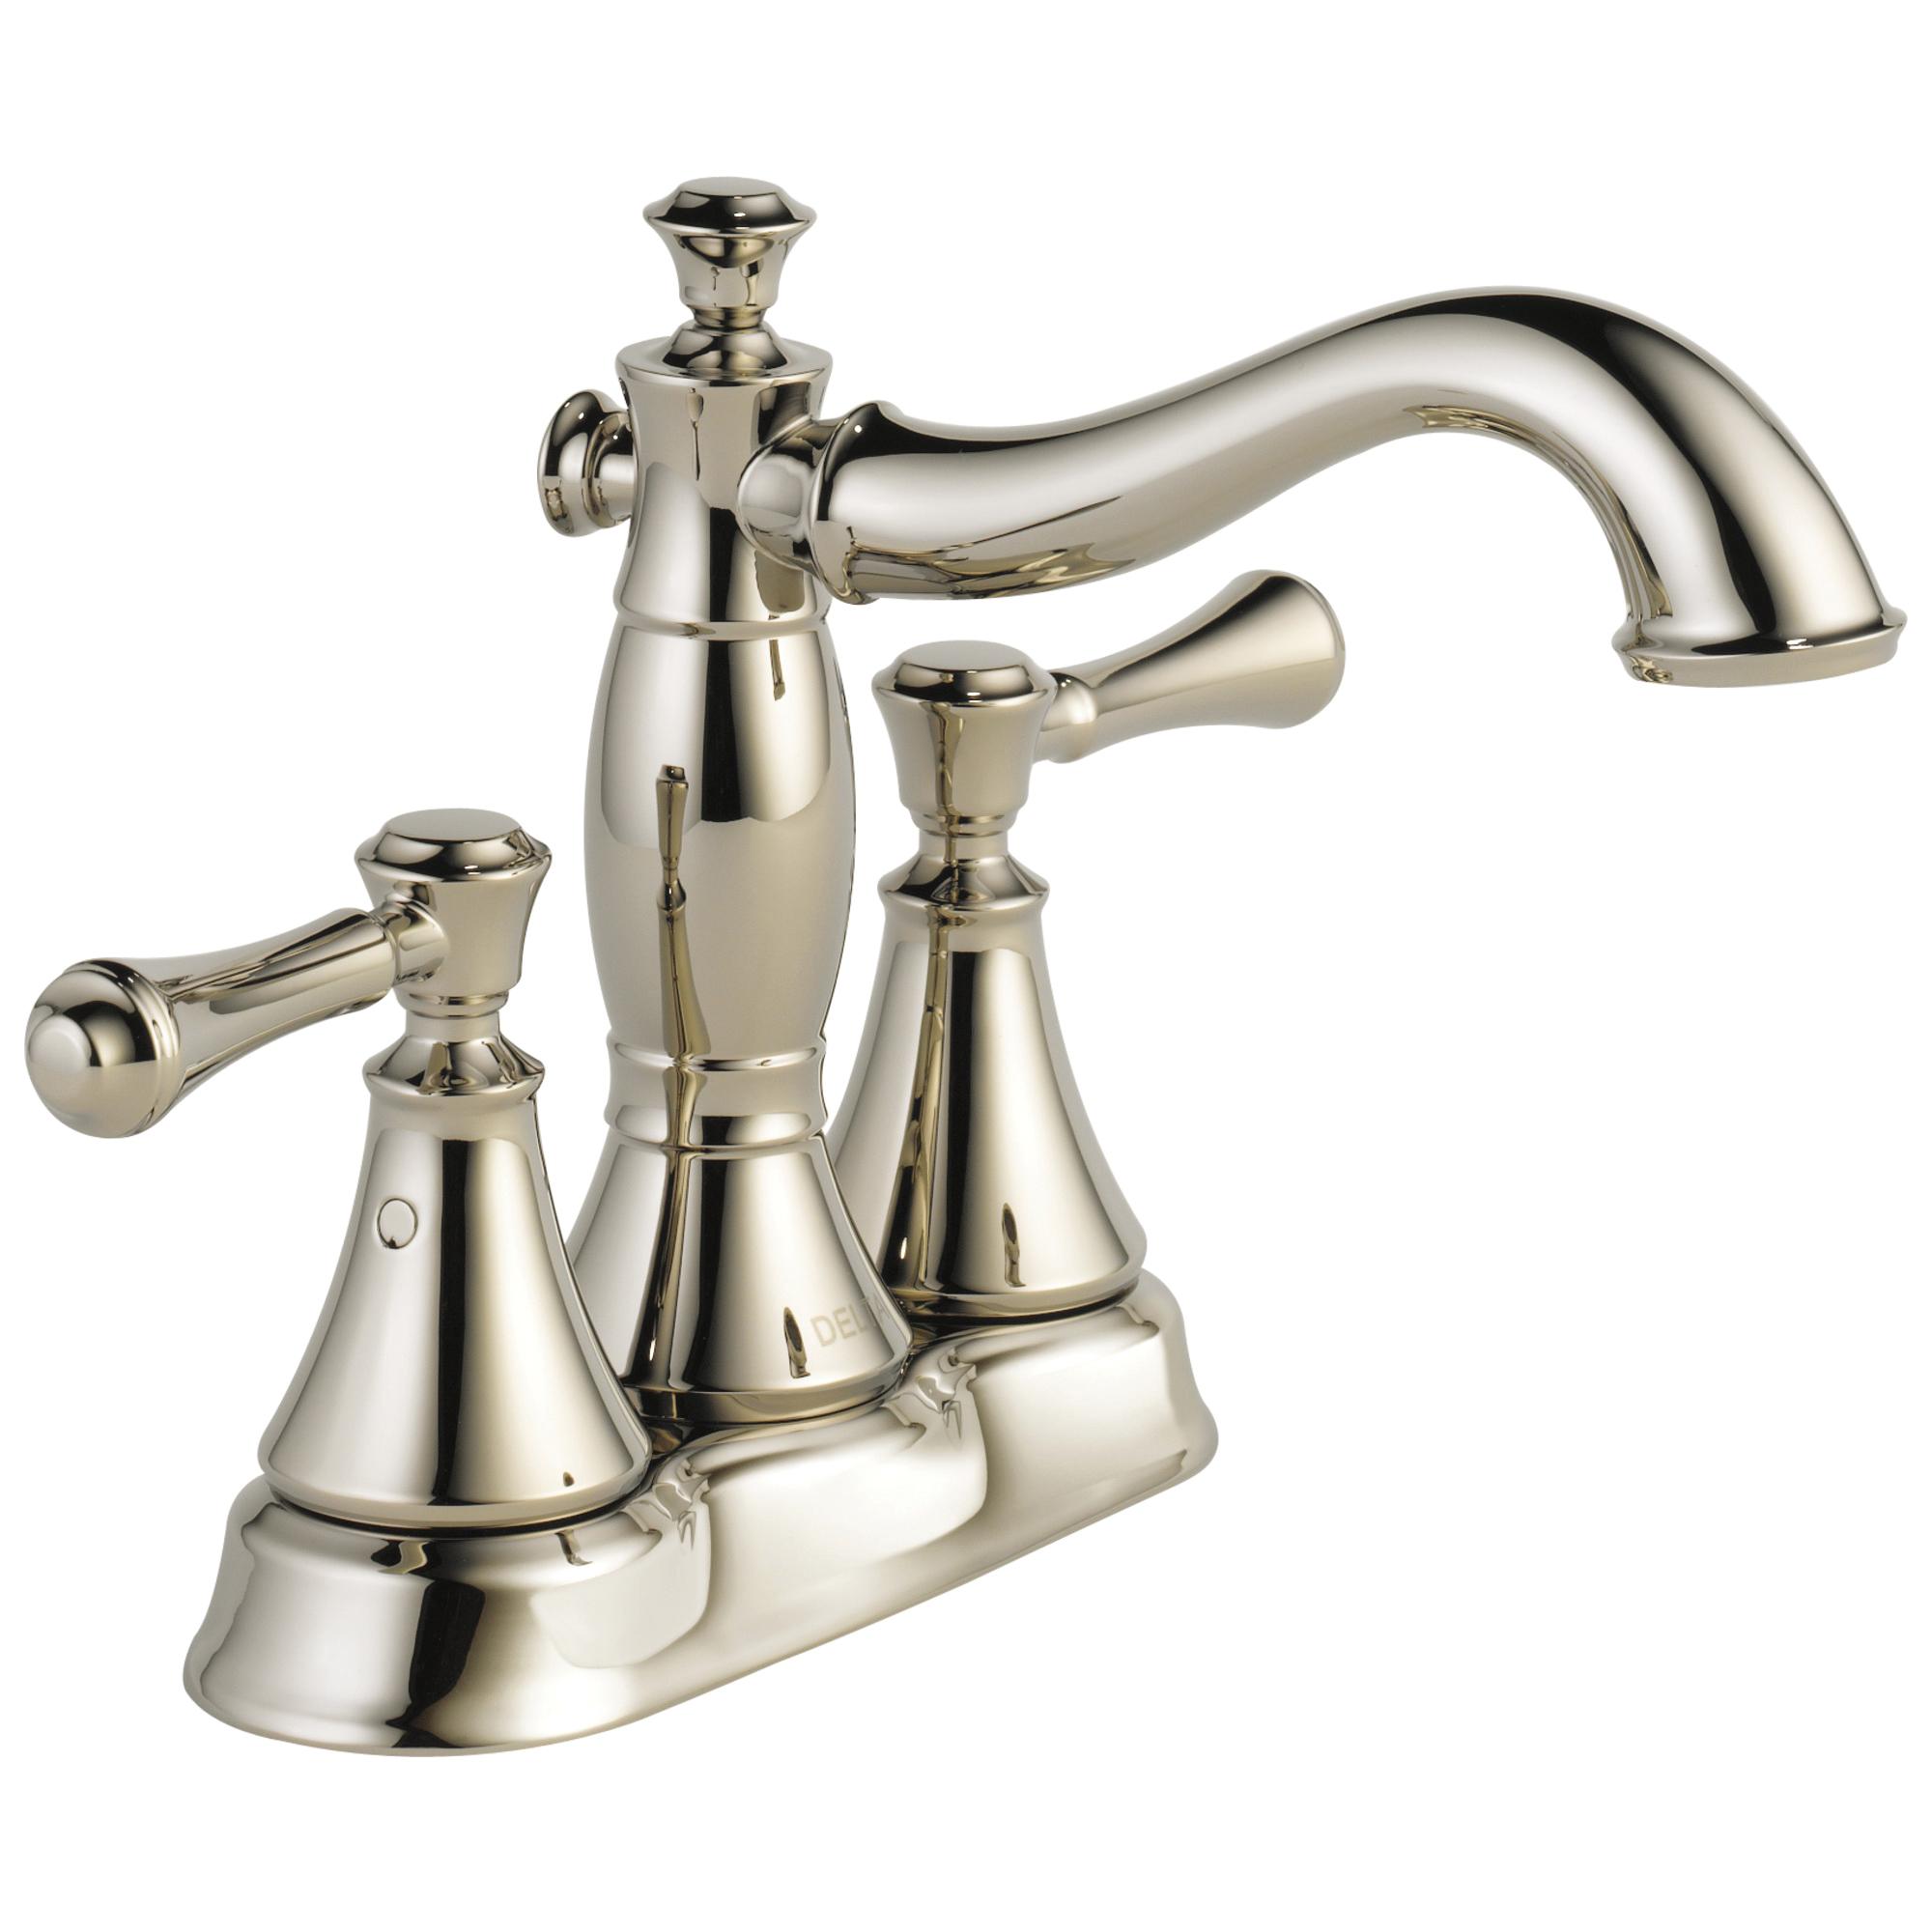 DELTA® 2597LF-PNMPU Centerset Lavatory Faucet, Cassidy™, Polished Nickel, 2 Handles, Metal Pop-Up Drain, 1.2 gpm